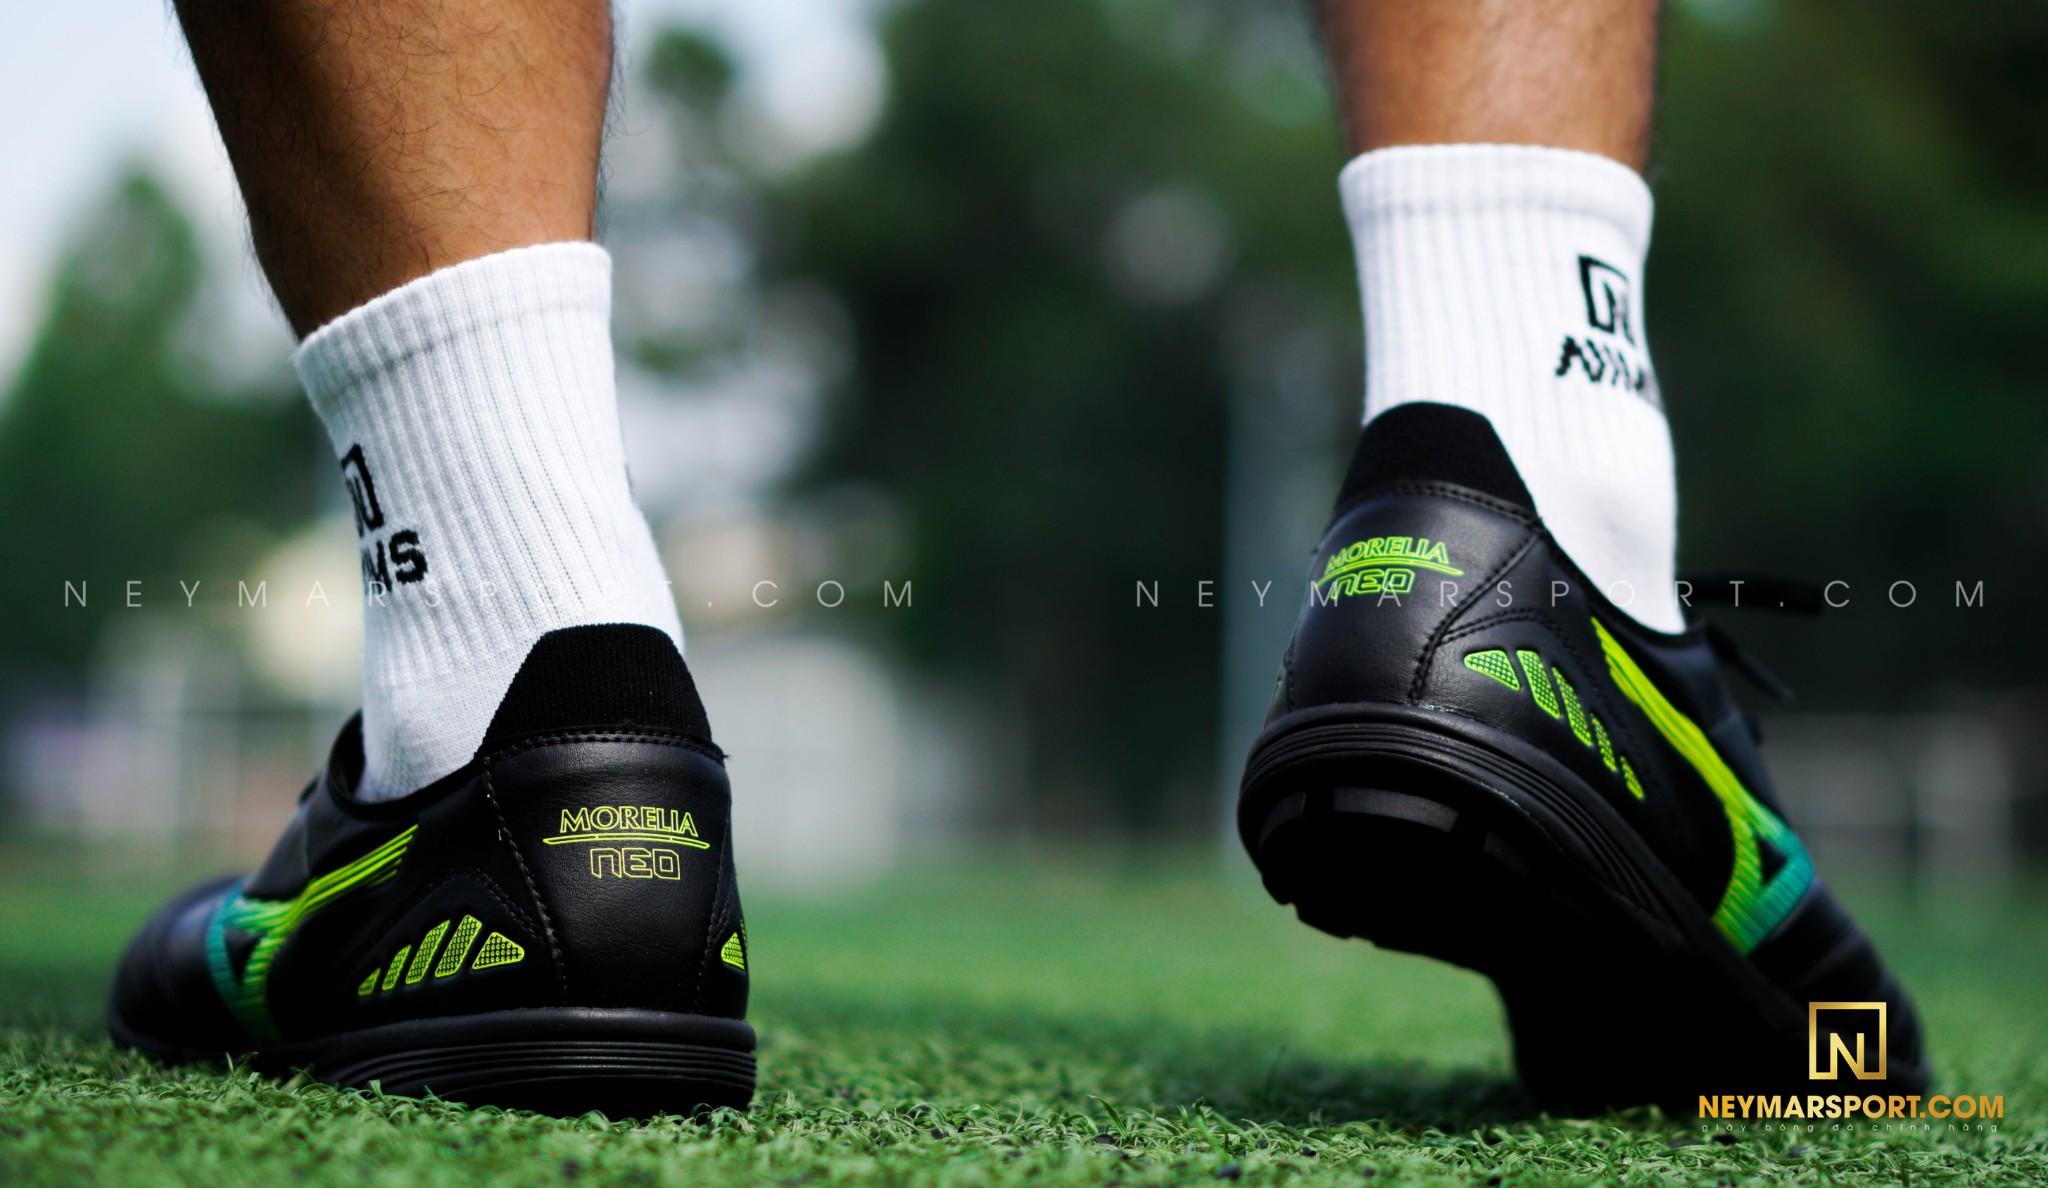 Giày đá bóng Mizuno Morelia Neo III Pro AS TF Black/Blue/Orange